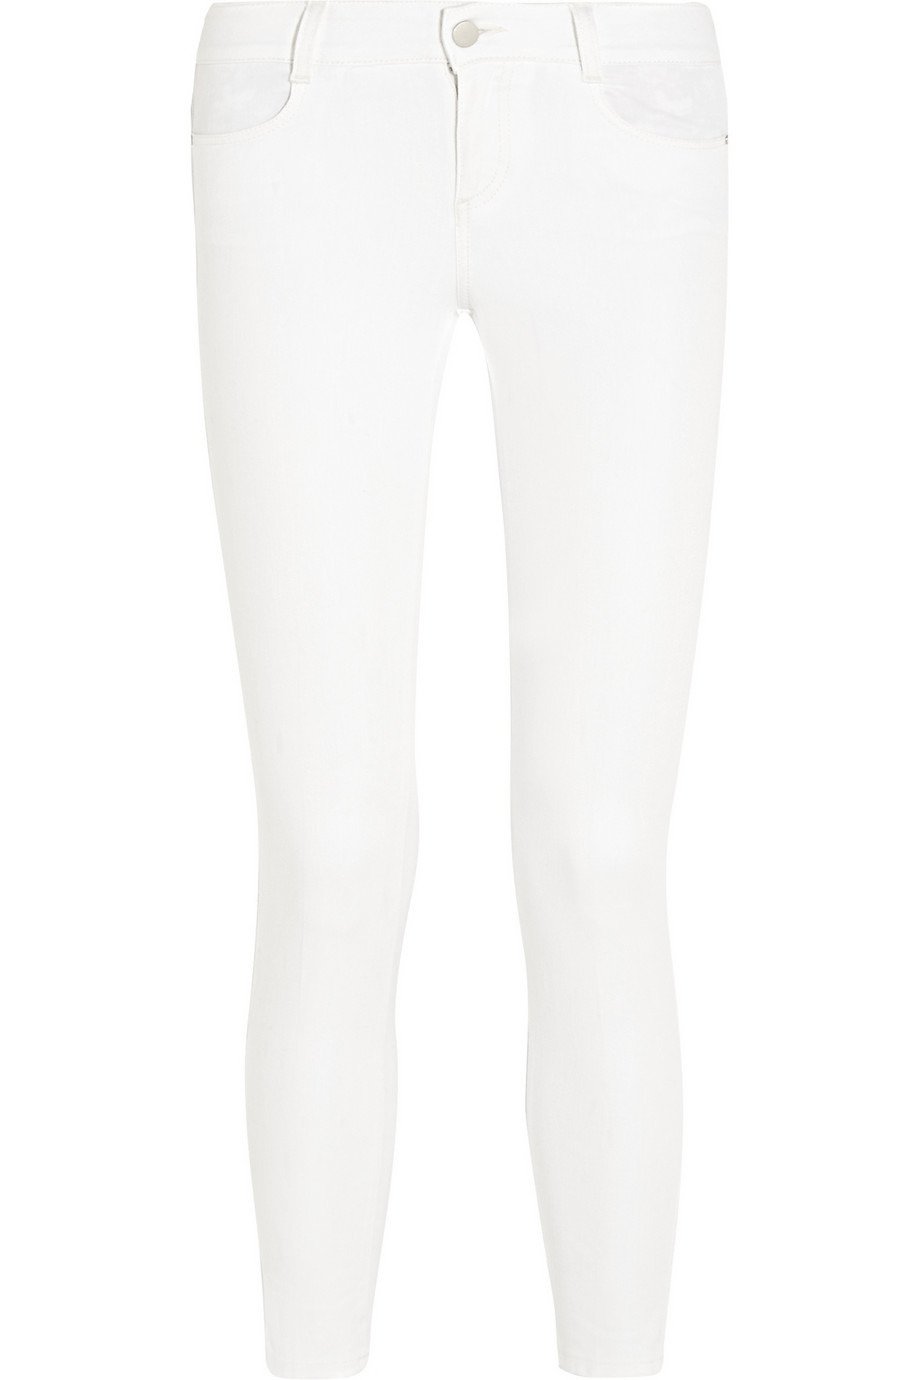 STELLA MCCARTNEY Mid-rise skinny jeans $275